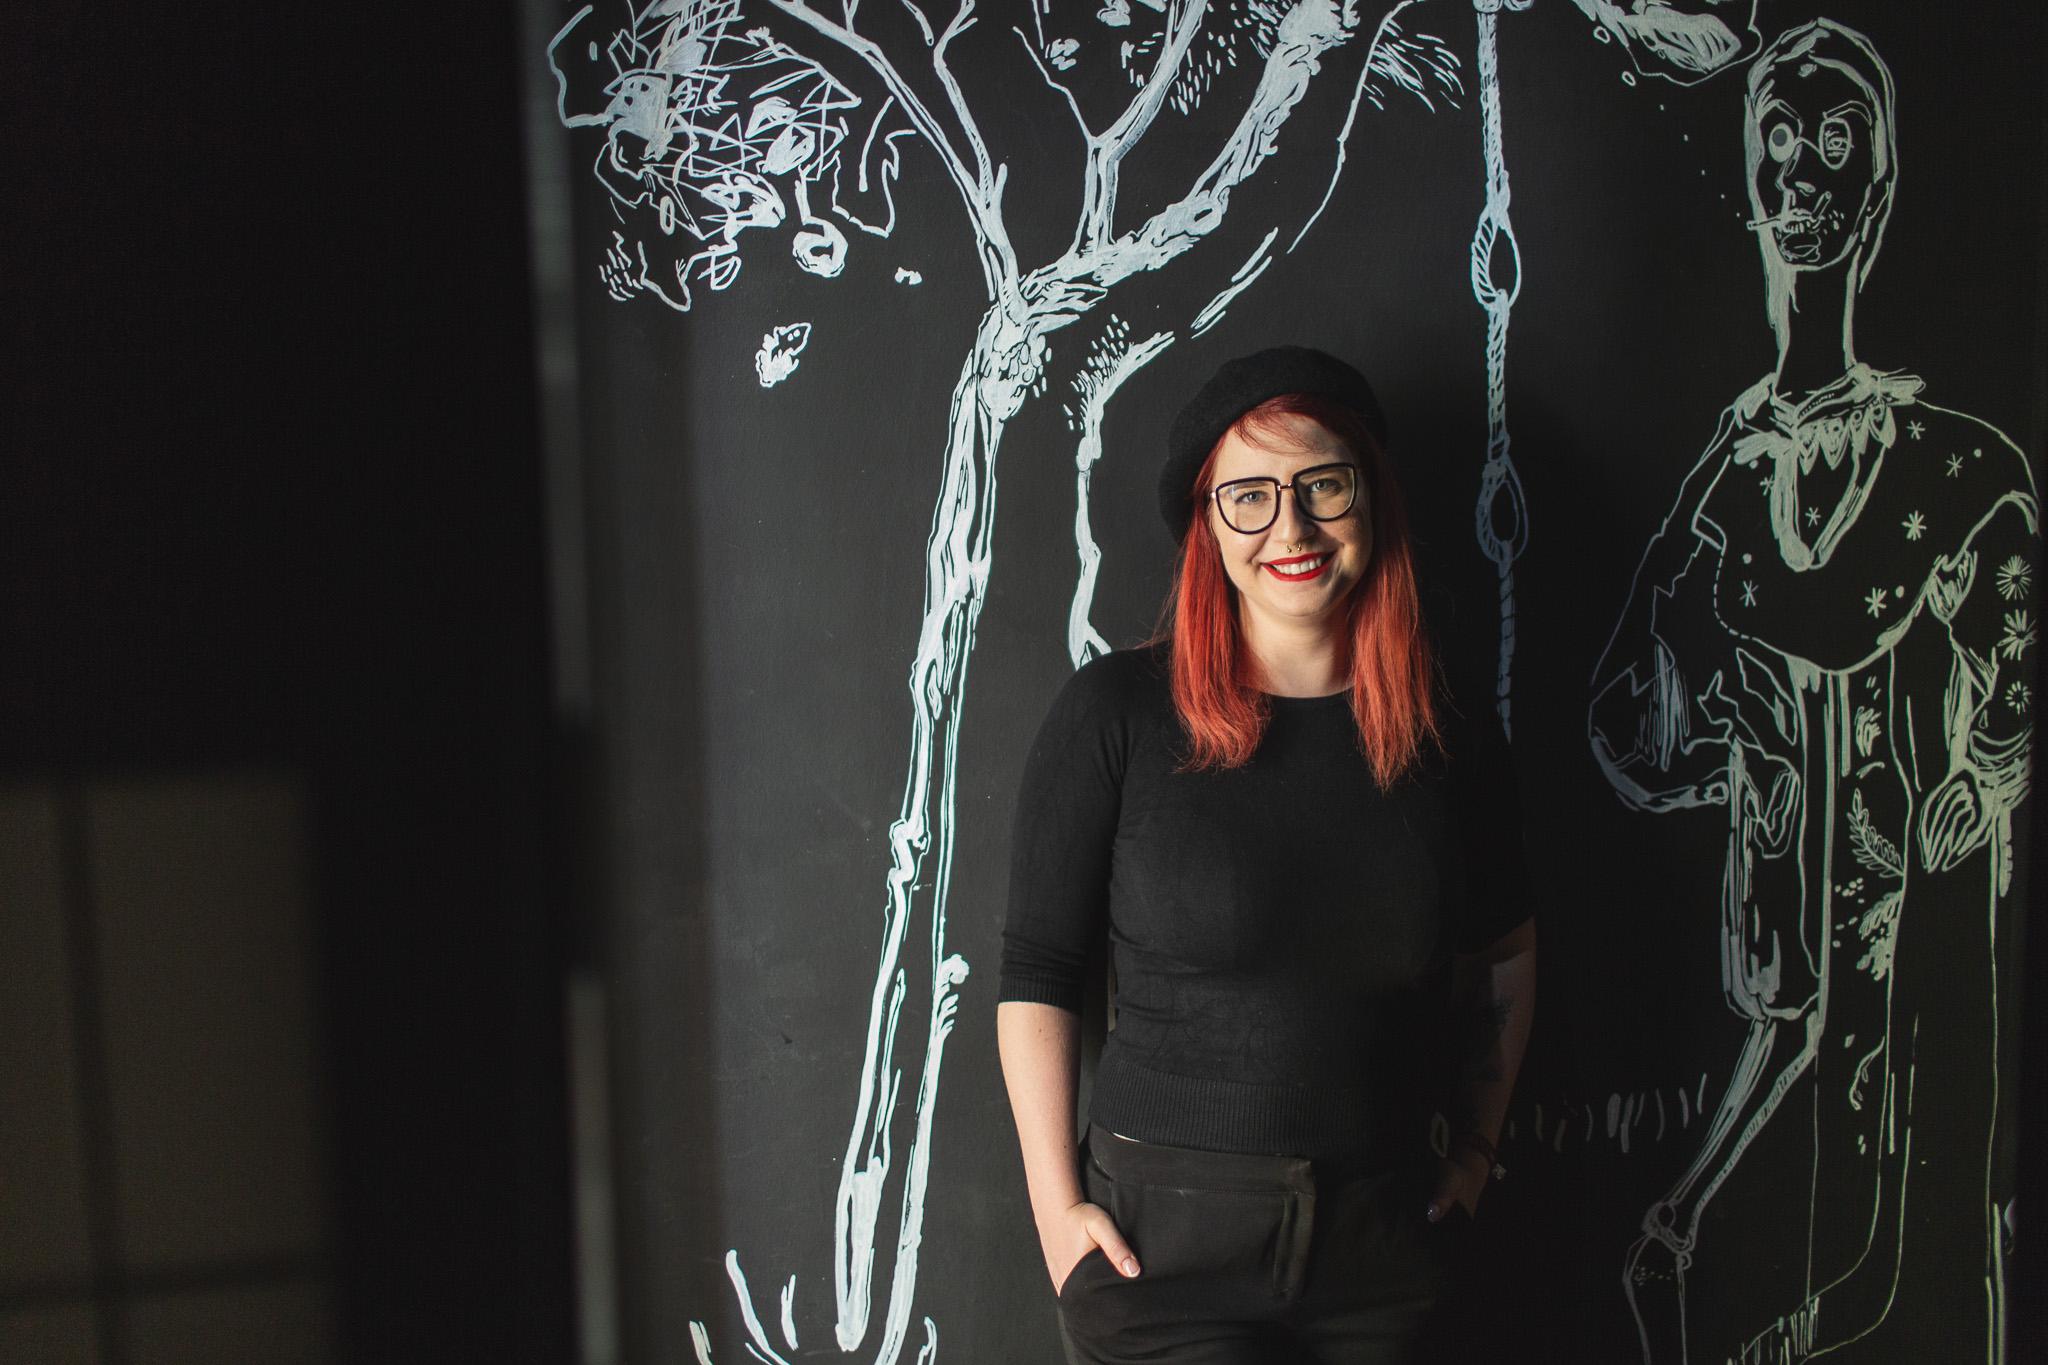 Martina s typickými Mad Drop ilustráciami